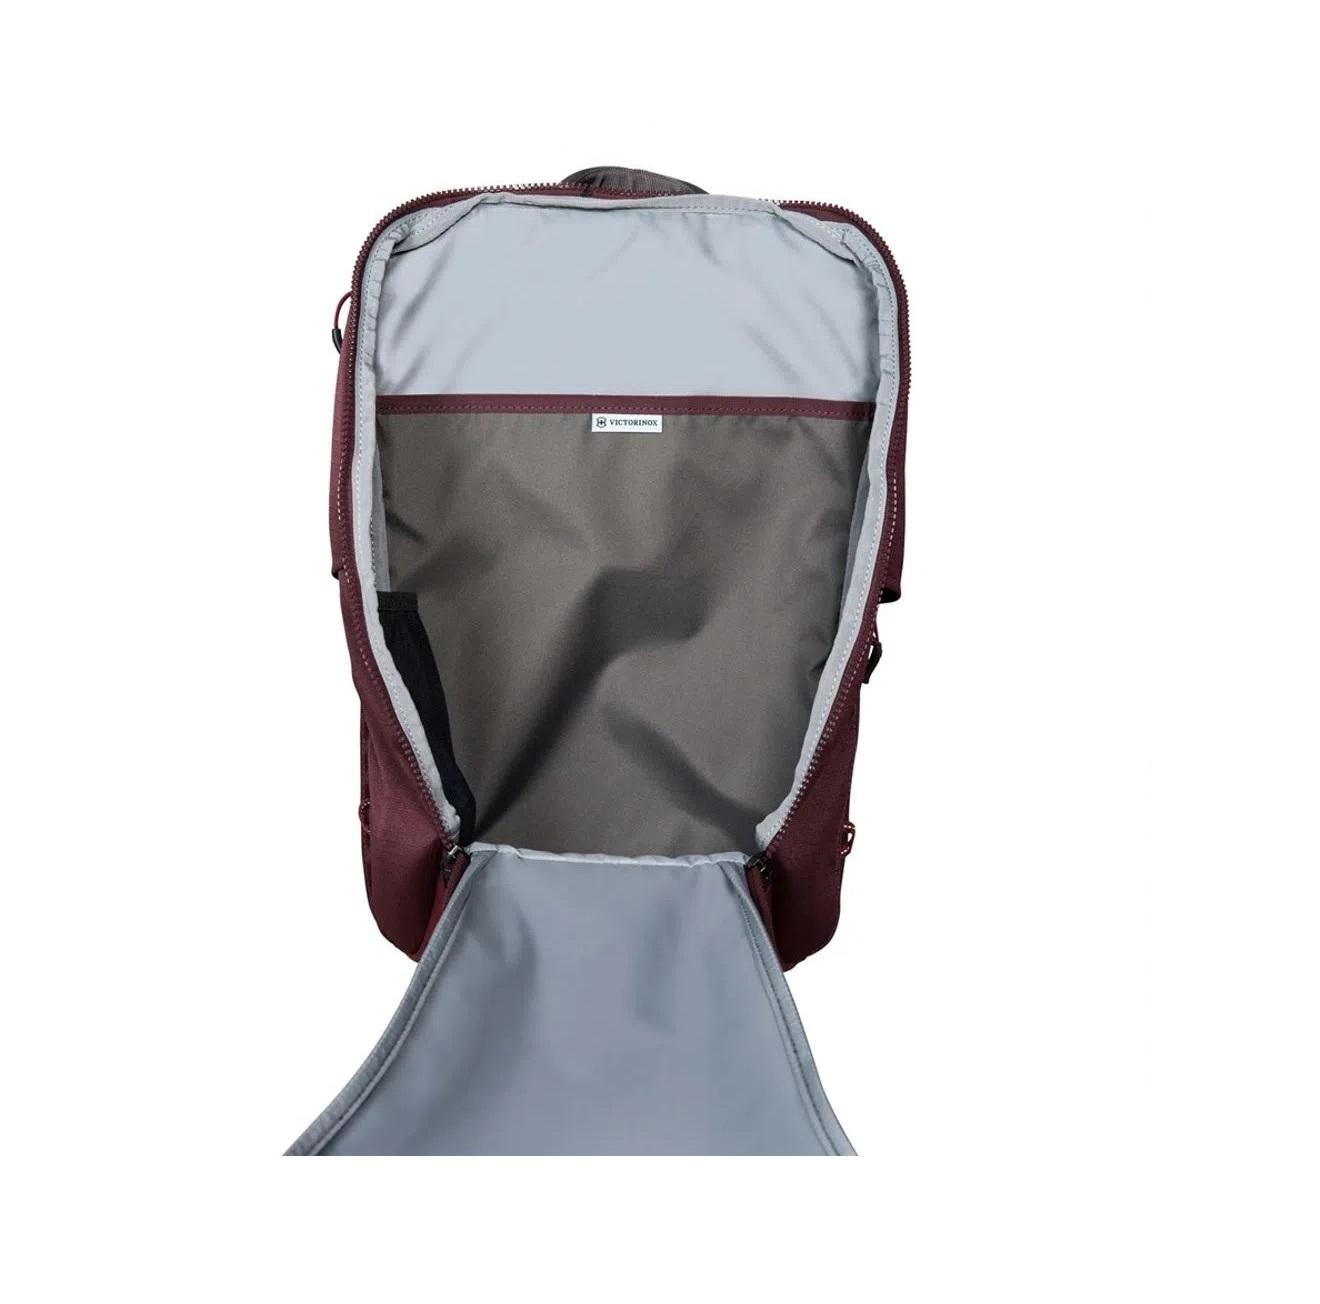 Mochila laptop 13 abertura frontal e lateral Altmont Active Everday Victorinox 602134  - Mix Eletro